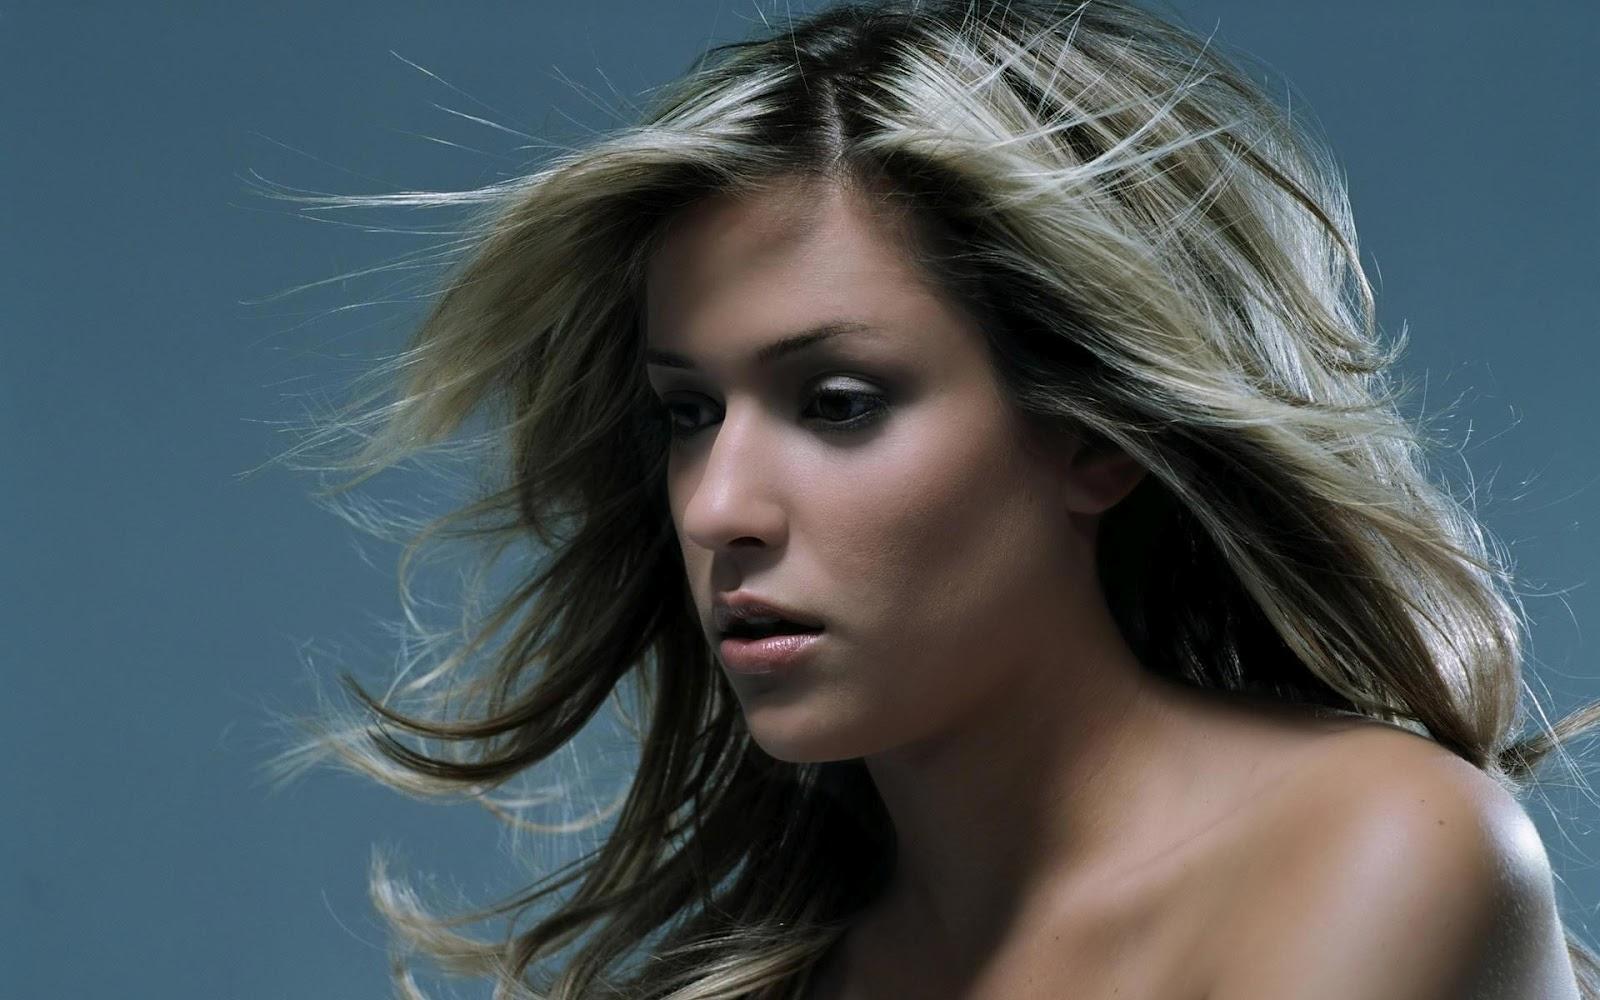 http://3.bp.blogspot.com/--NJ2L2T_pXY/UCM3IUqj7II/AAAAAAAAFRs/AgglTr48MDg/s1600/Hair+Style13.jpg